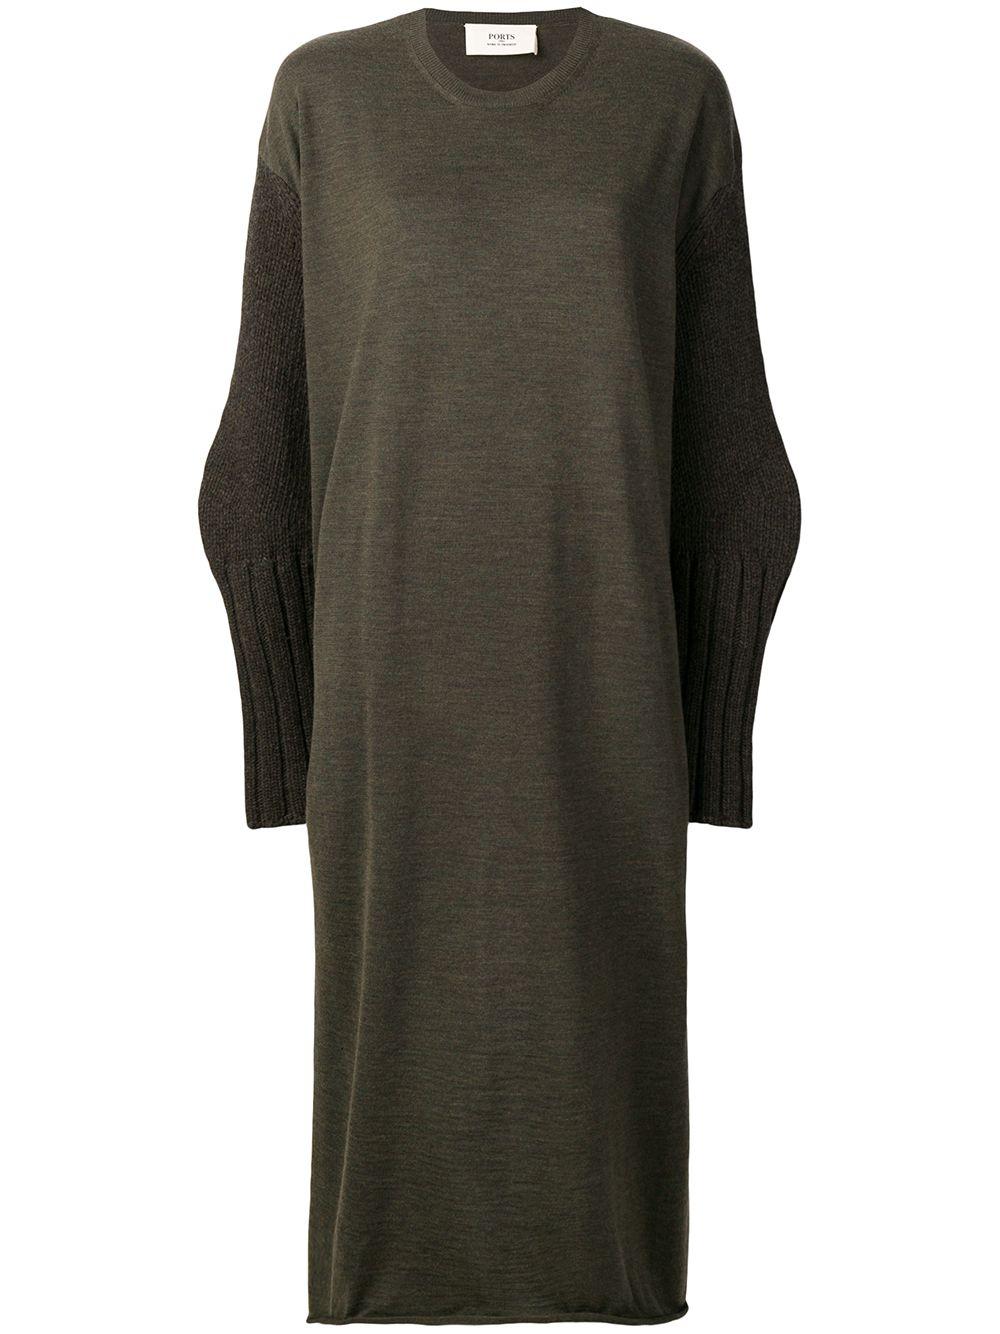 Ports 1961 | asymmetrical jumper | Clouty